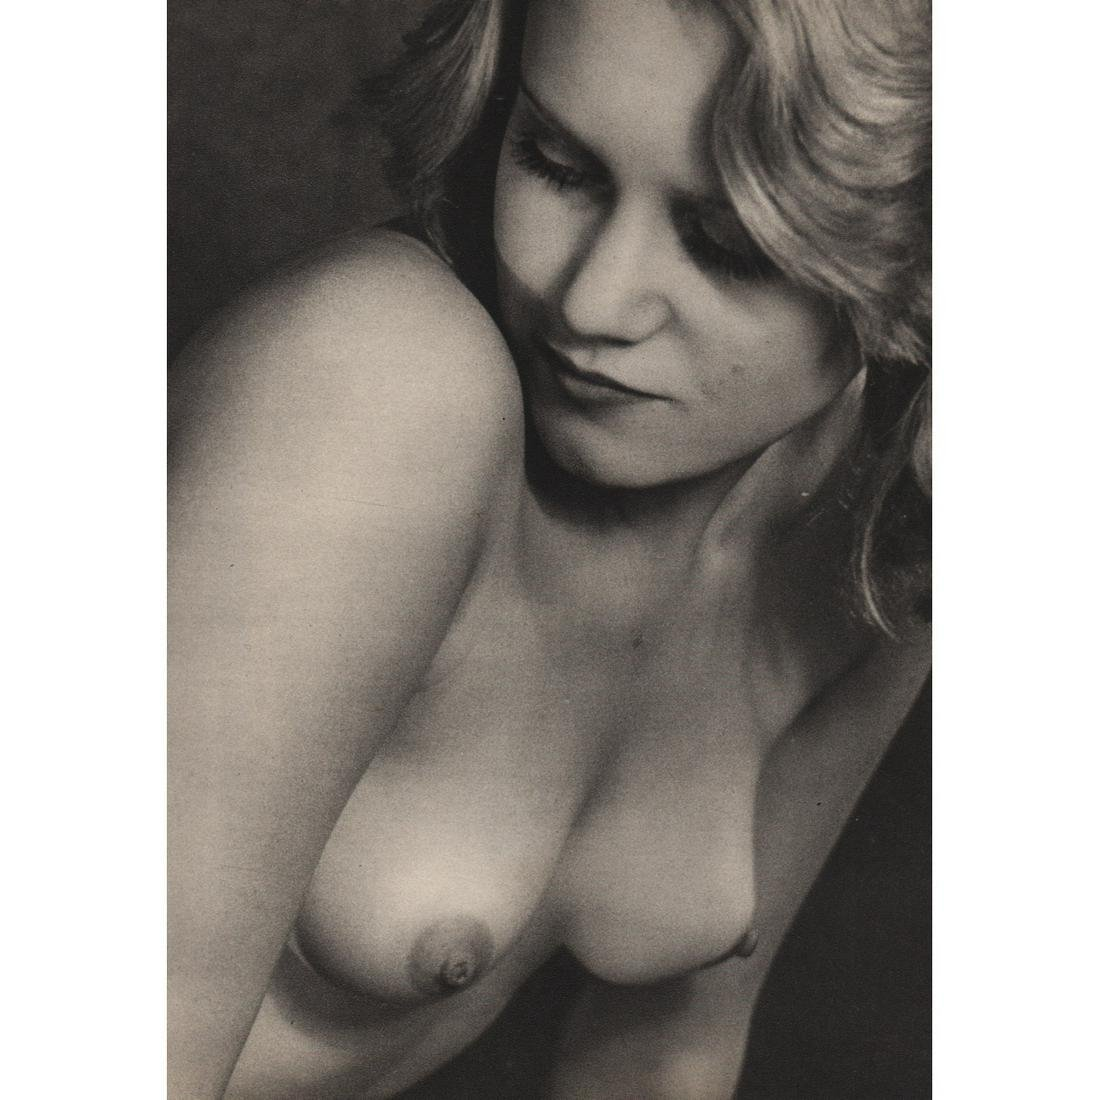 VACLAV JIRU - Composition II - Nude